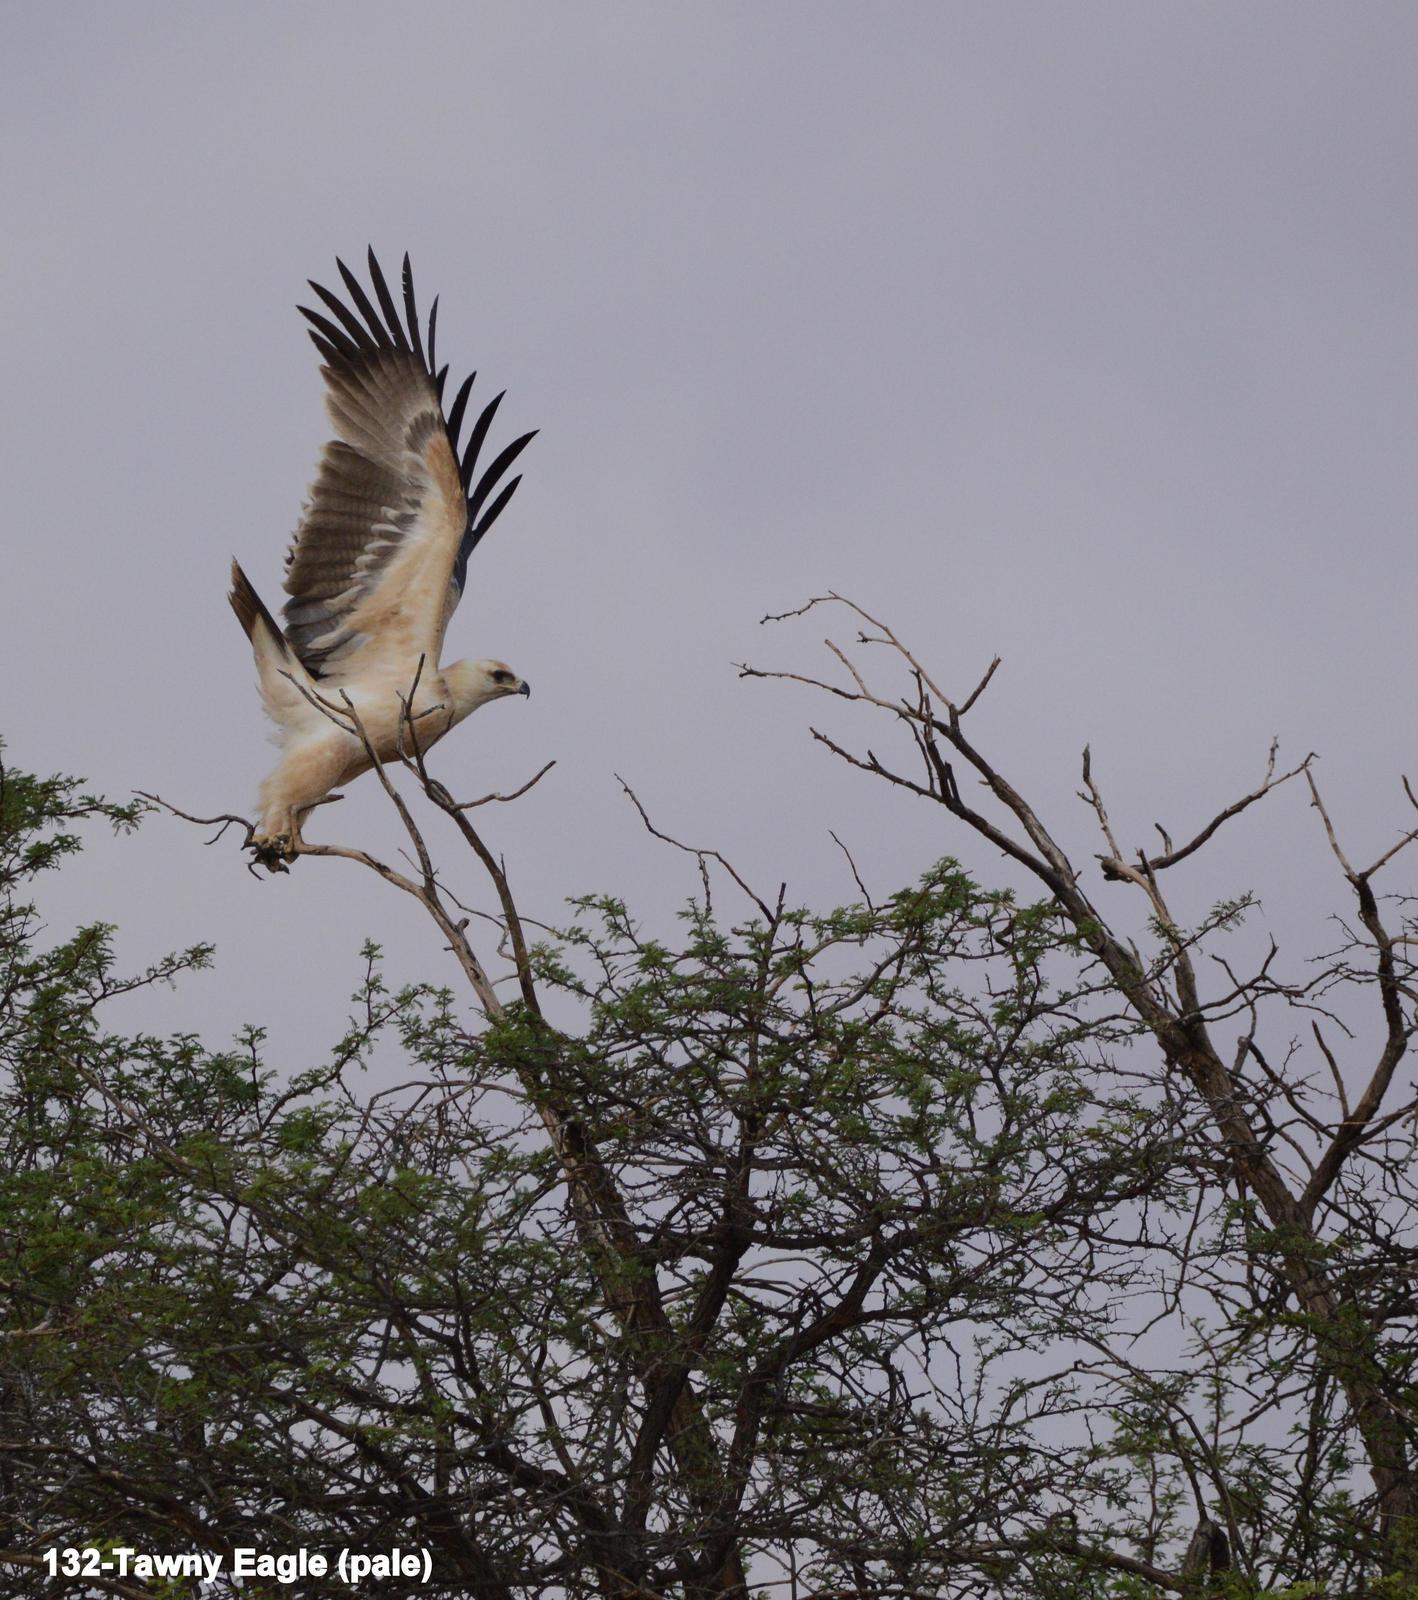 Tawny Eagle Photo by Richard  Lowe